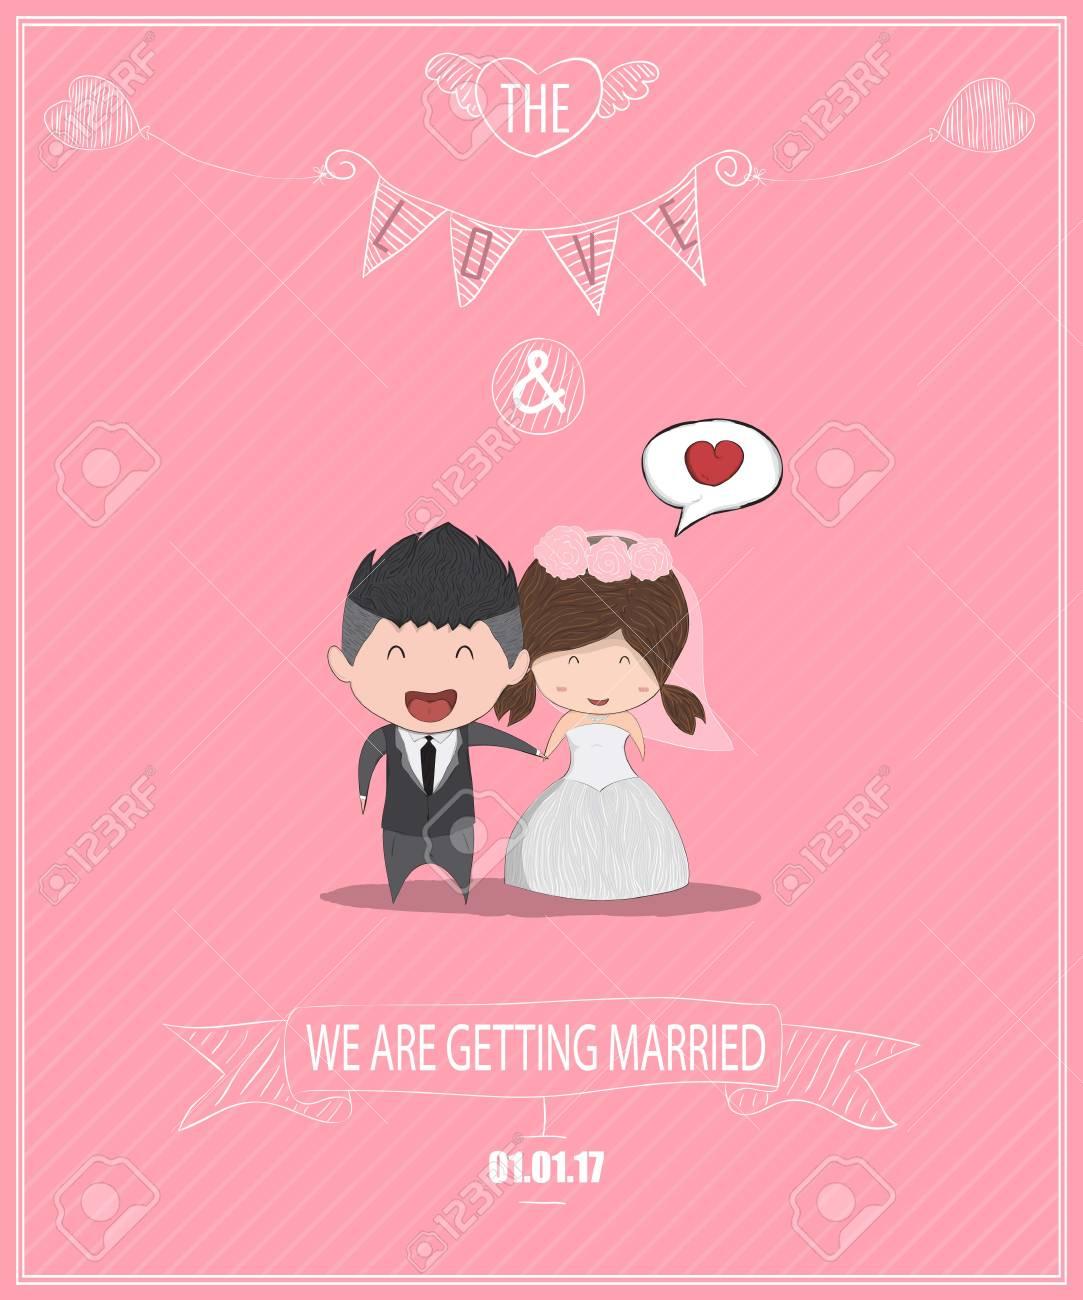 Duration Cute Cartoon Wedding Couple Men And Women Card Cute